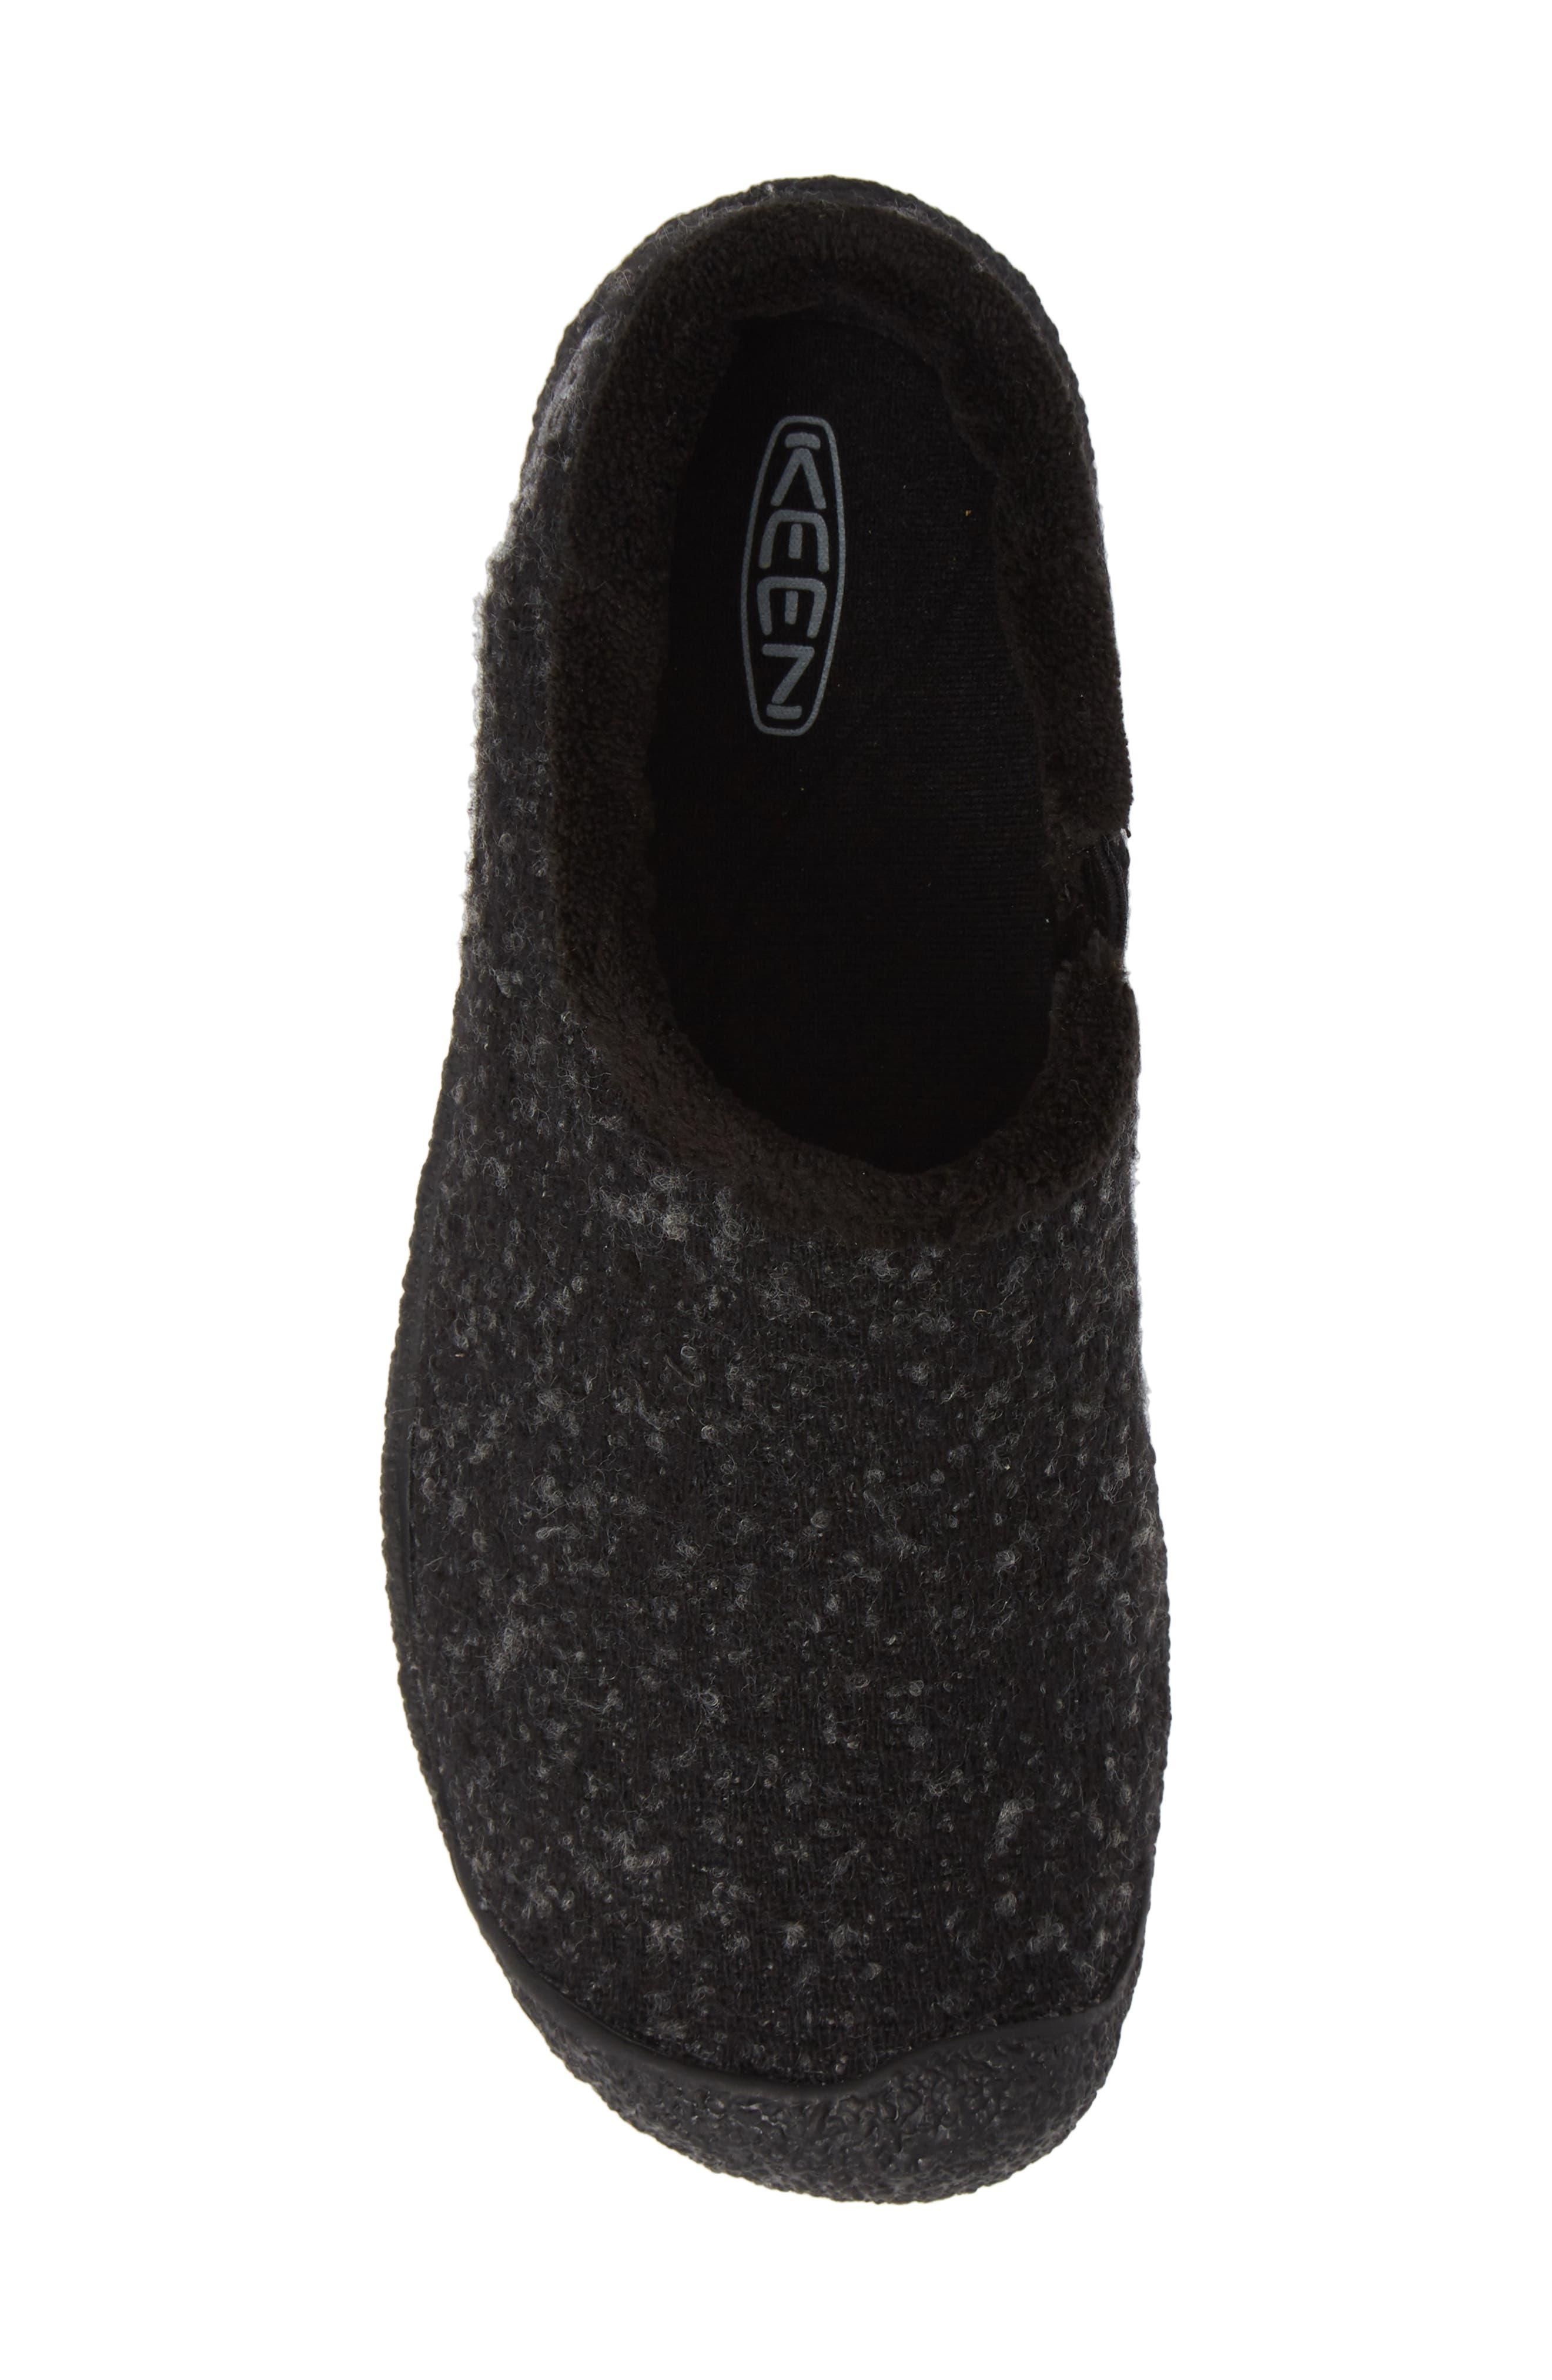 Howser Round Toe Wool Slip-on,                             Alternate thumbnail 5, color,                             BLACK KNOBBY/ STEEL GREY WOOL